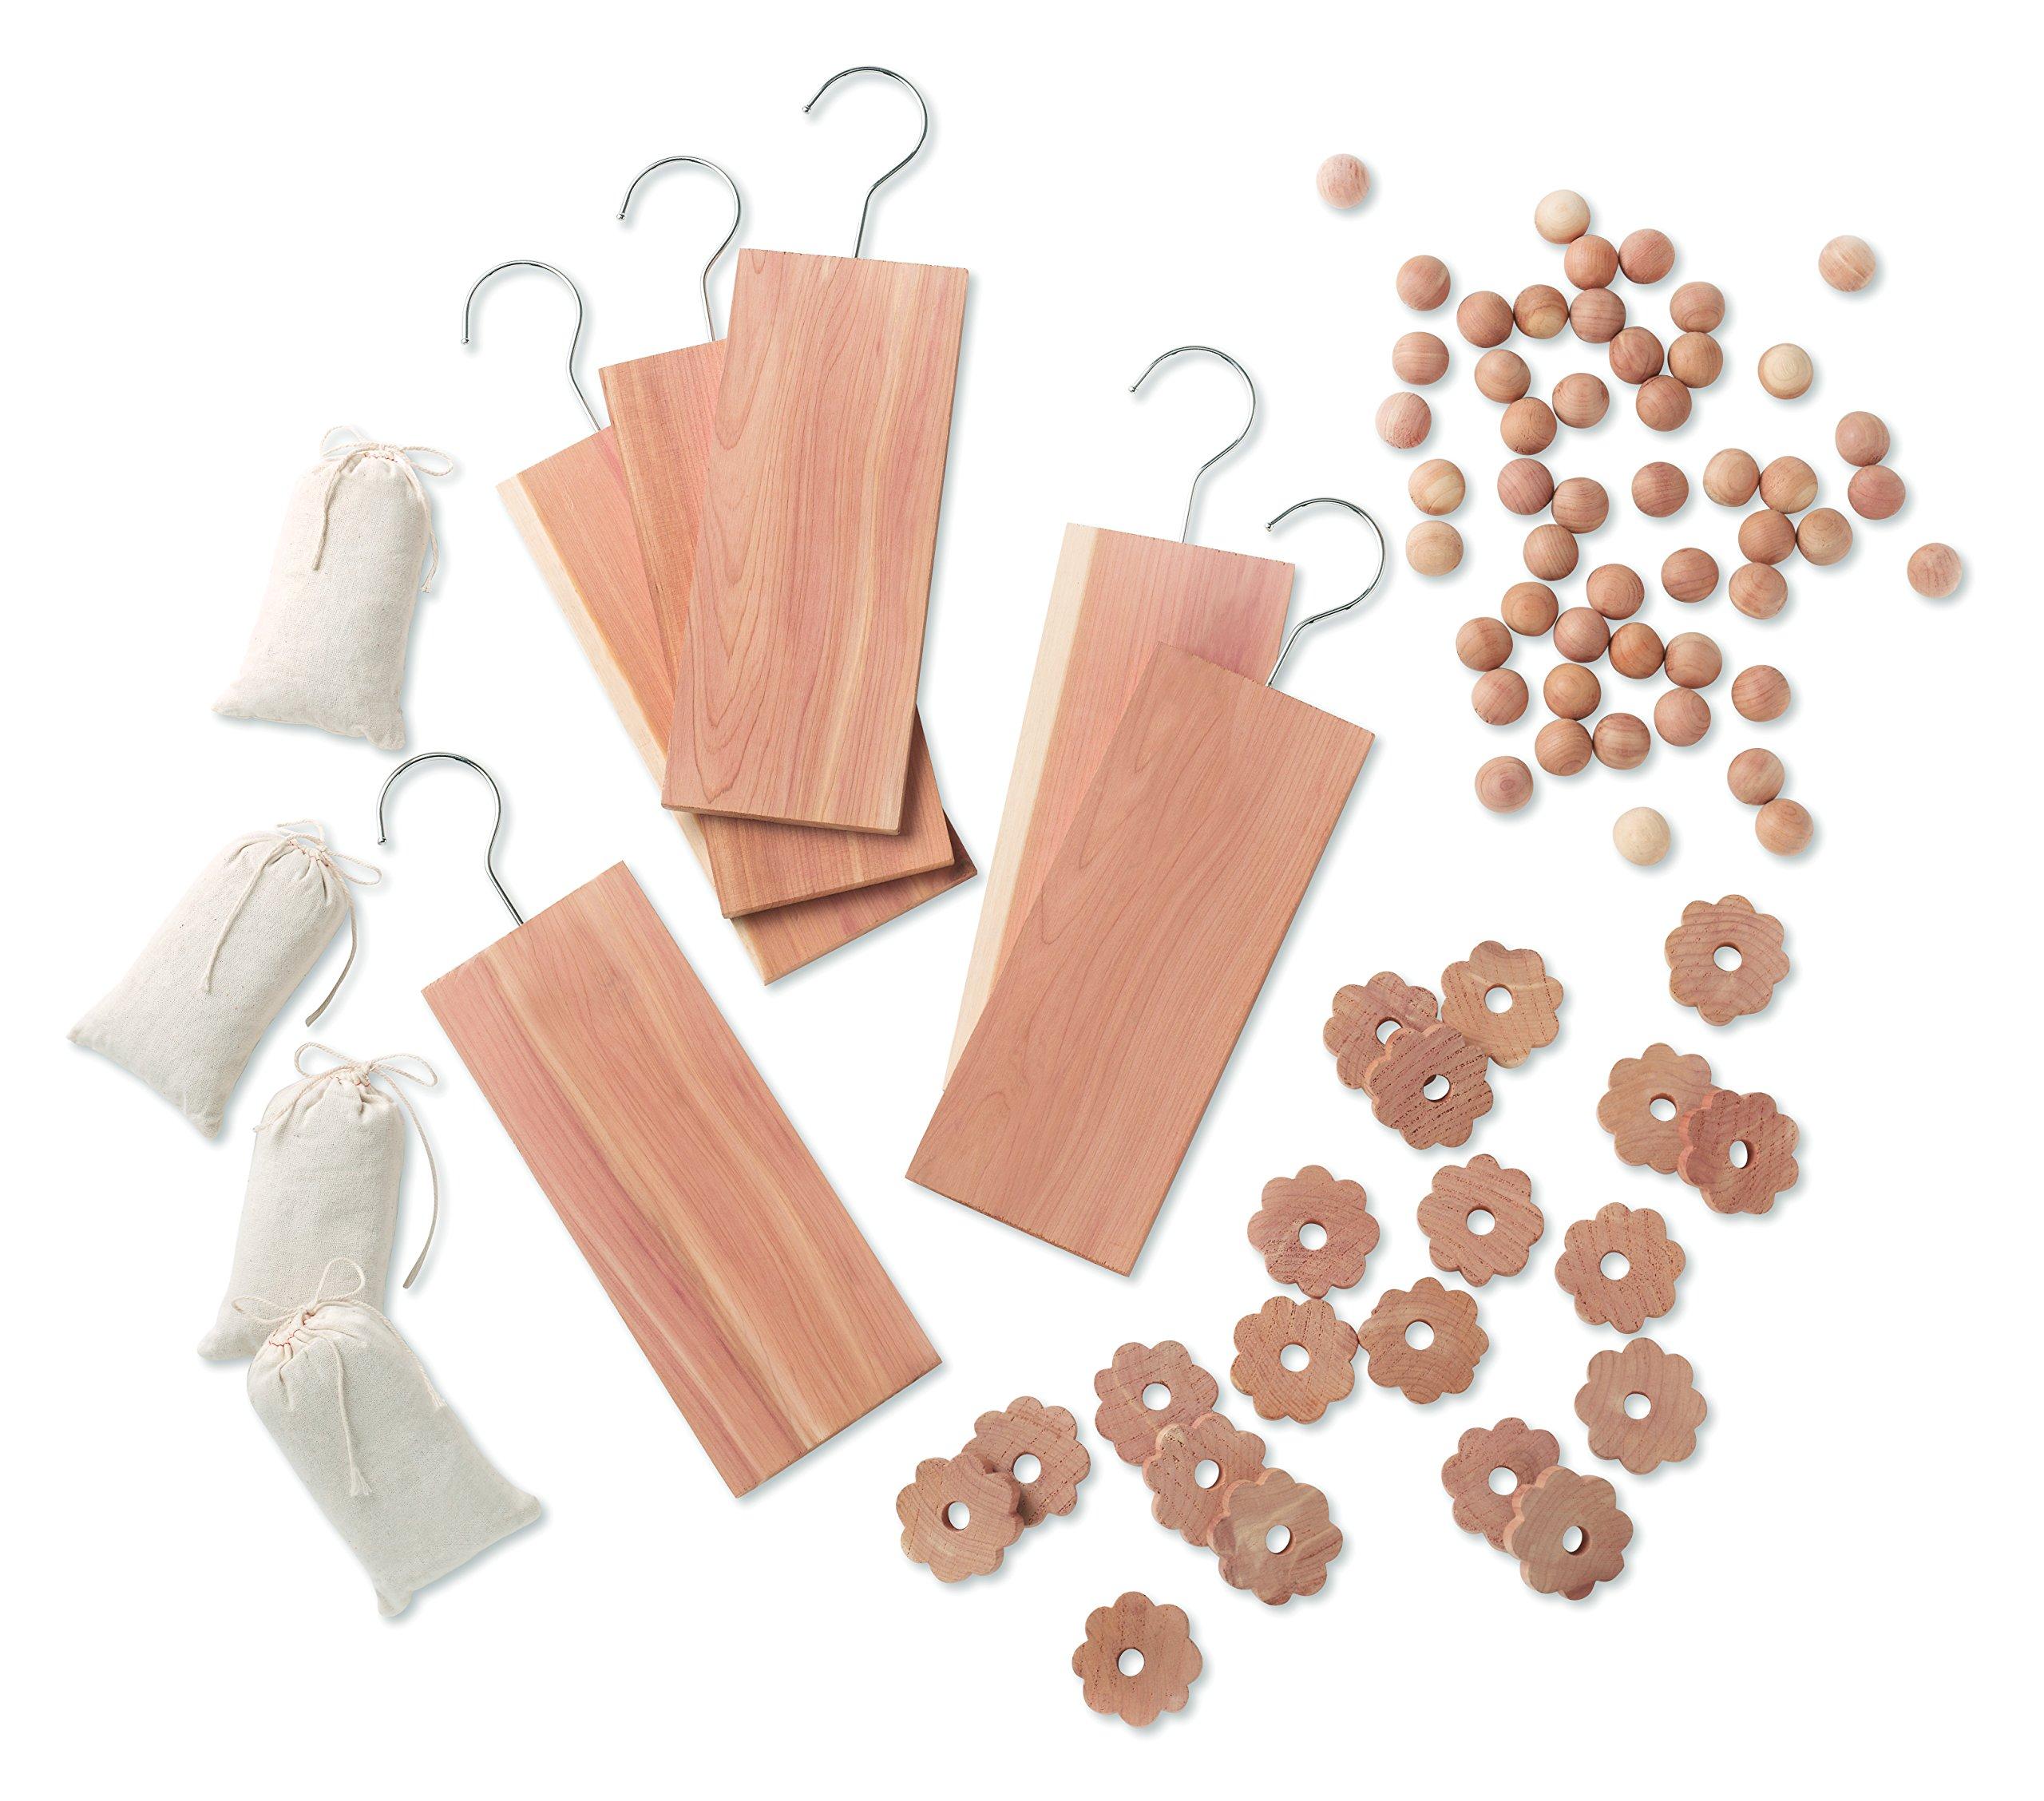 Whitmor Cedar Garment Protection, S/80